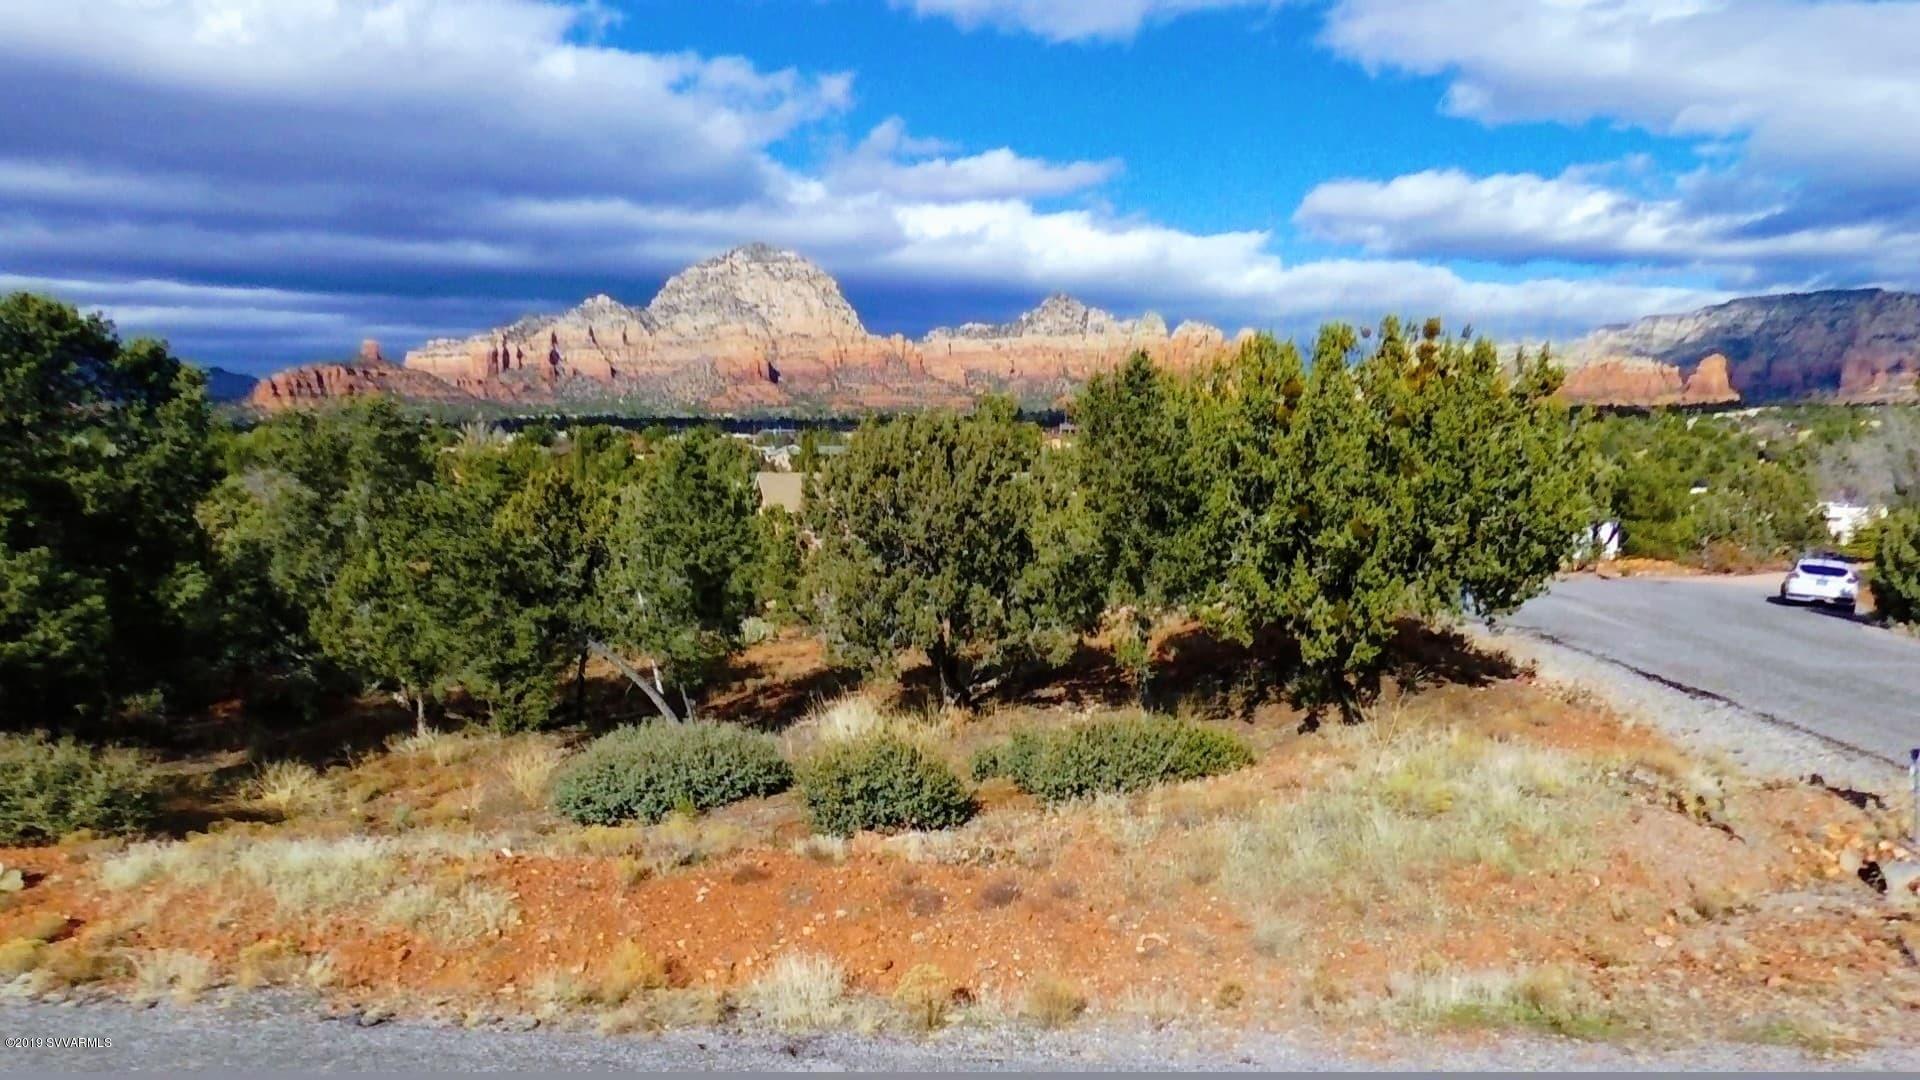 280 Panorama Blvd, Sedona, Arizona 86336, ,Lots And Land,For Sale,280 Panorama Blvd,524230